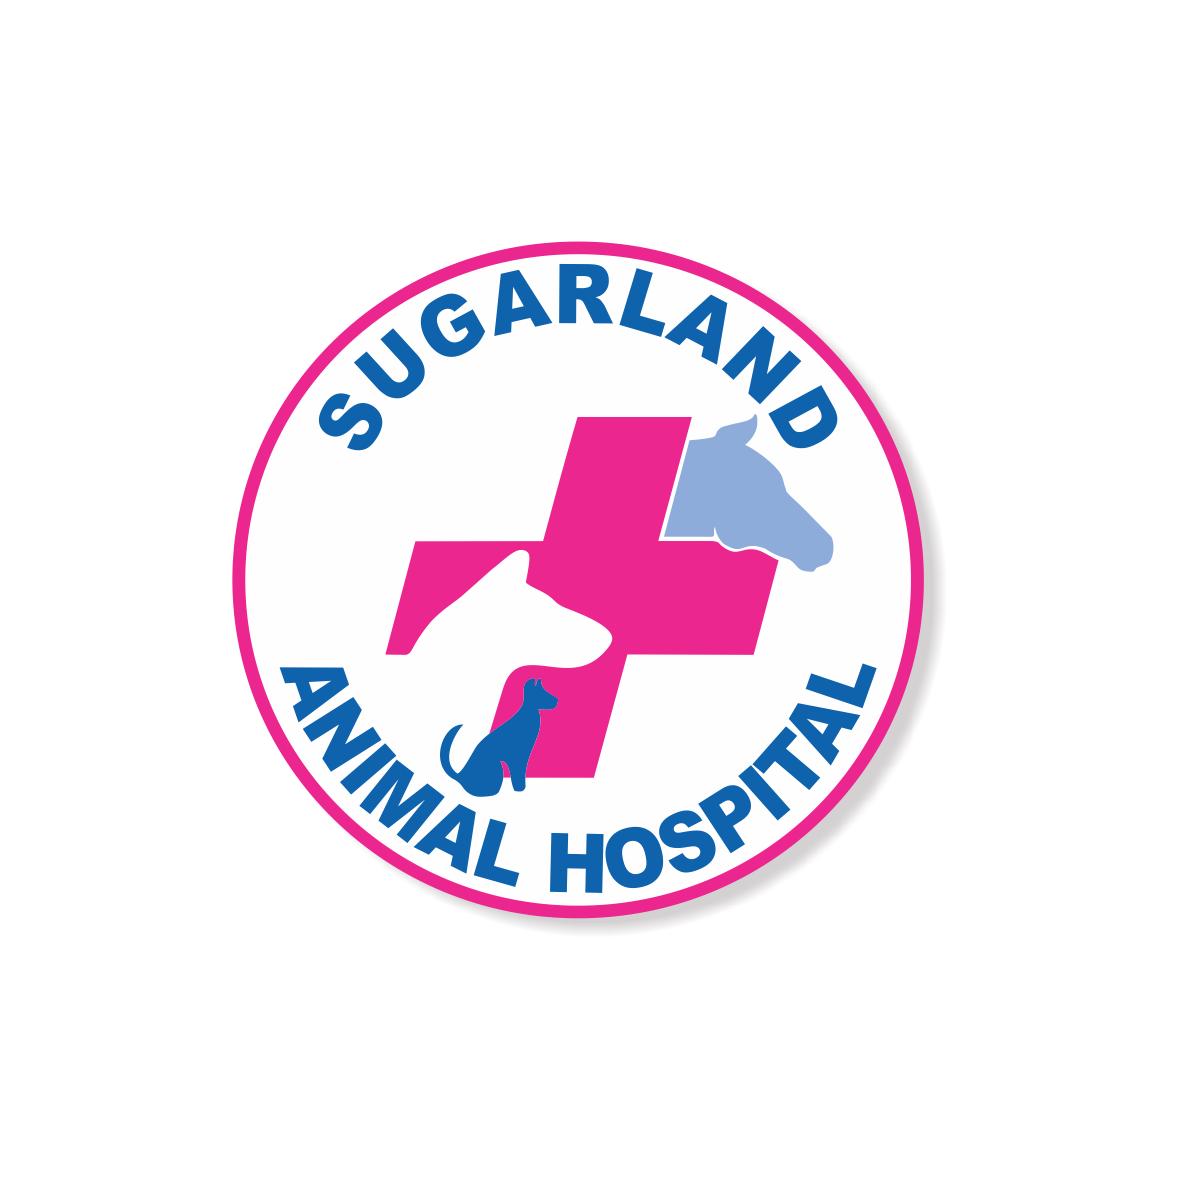 Sugarland Vet